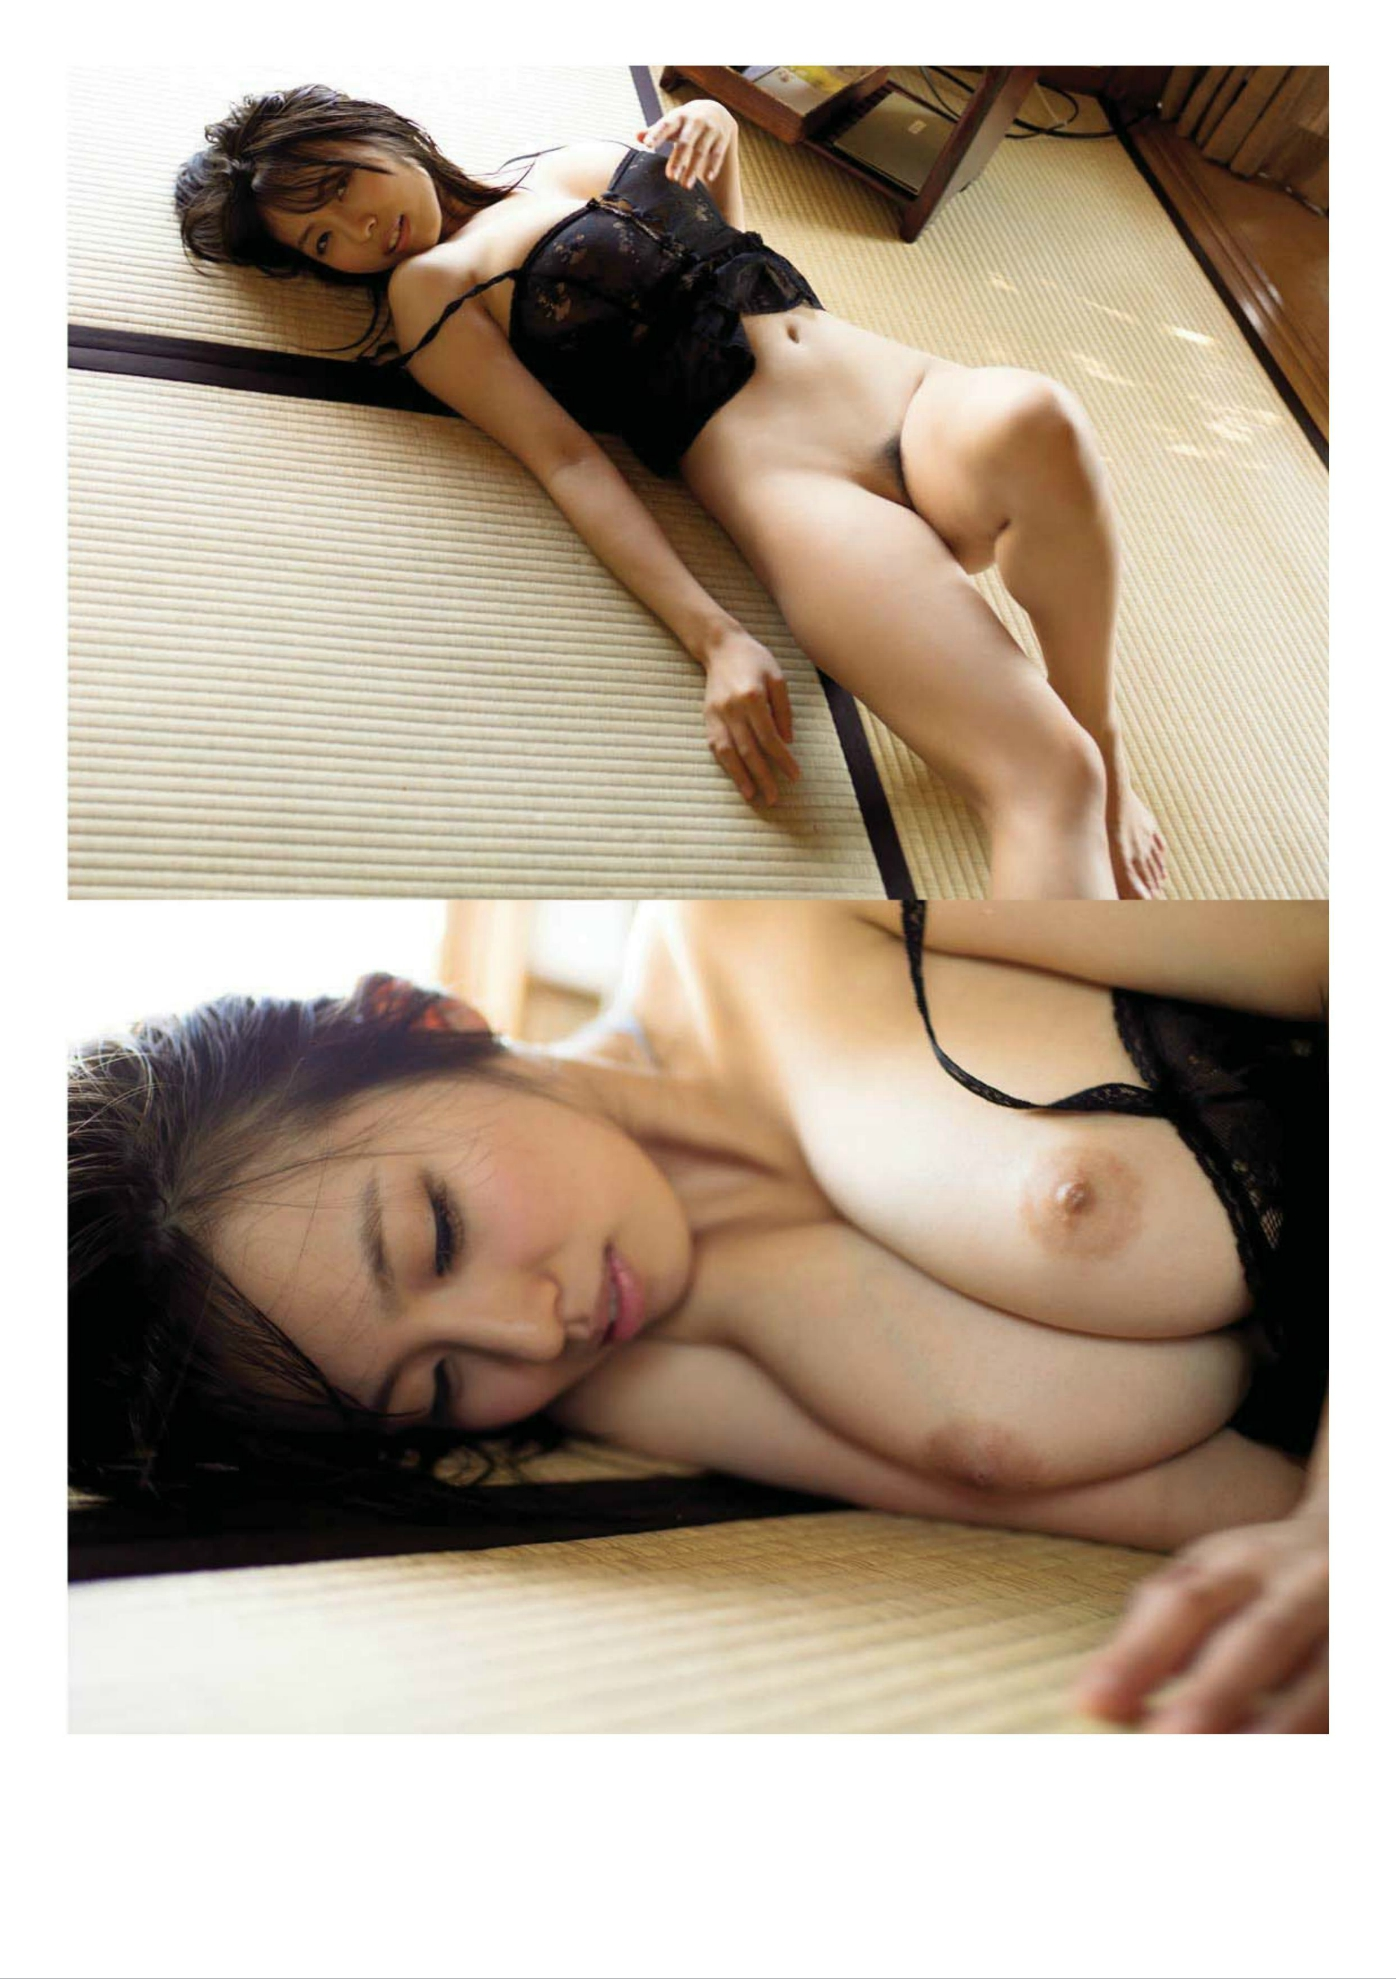 image http://scanlover.com/assets/images/2952-y0fdID9H56BWnfrx.jpeg